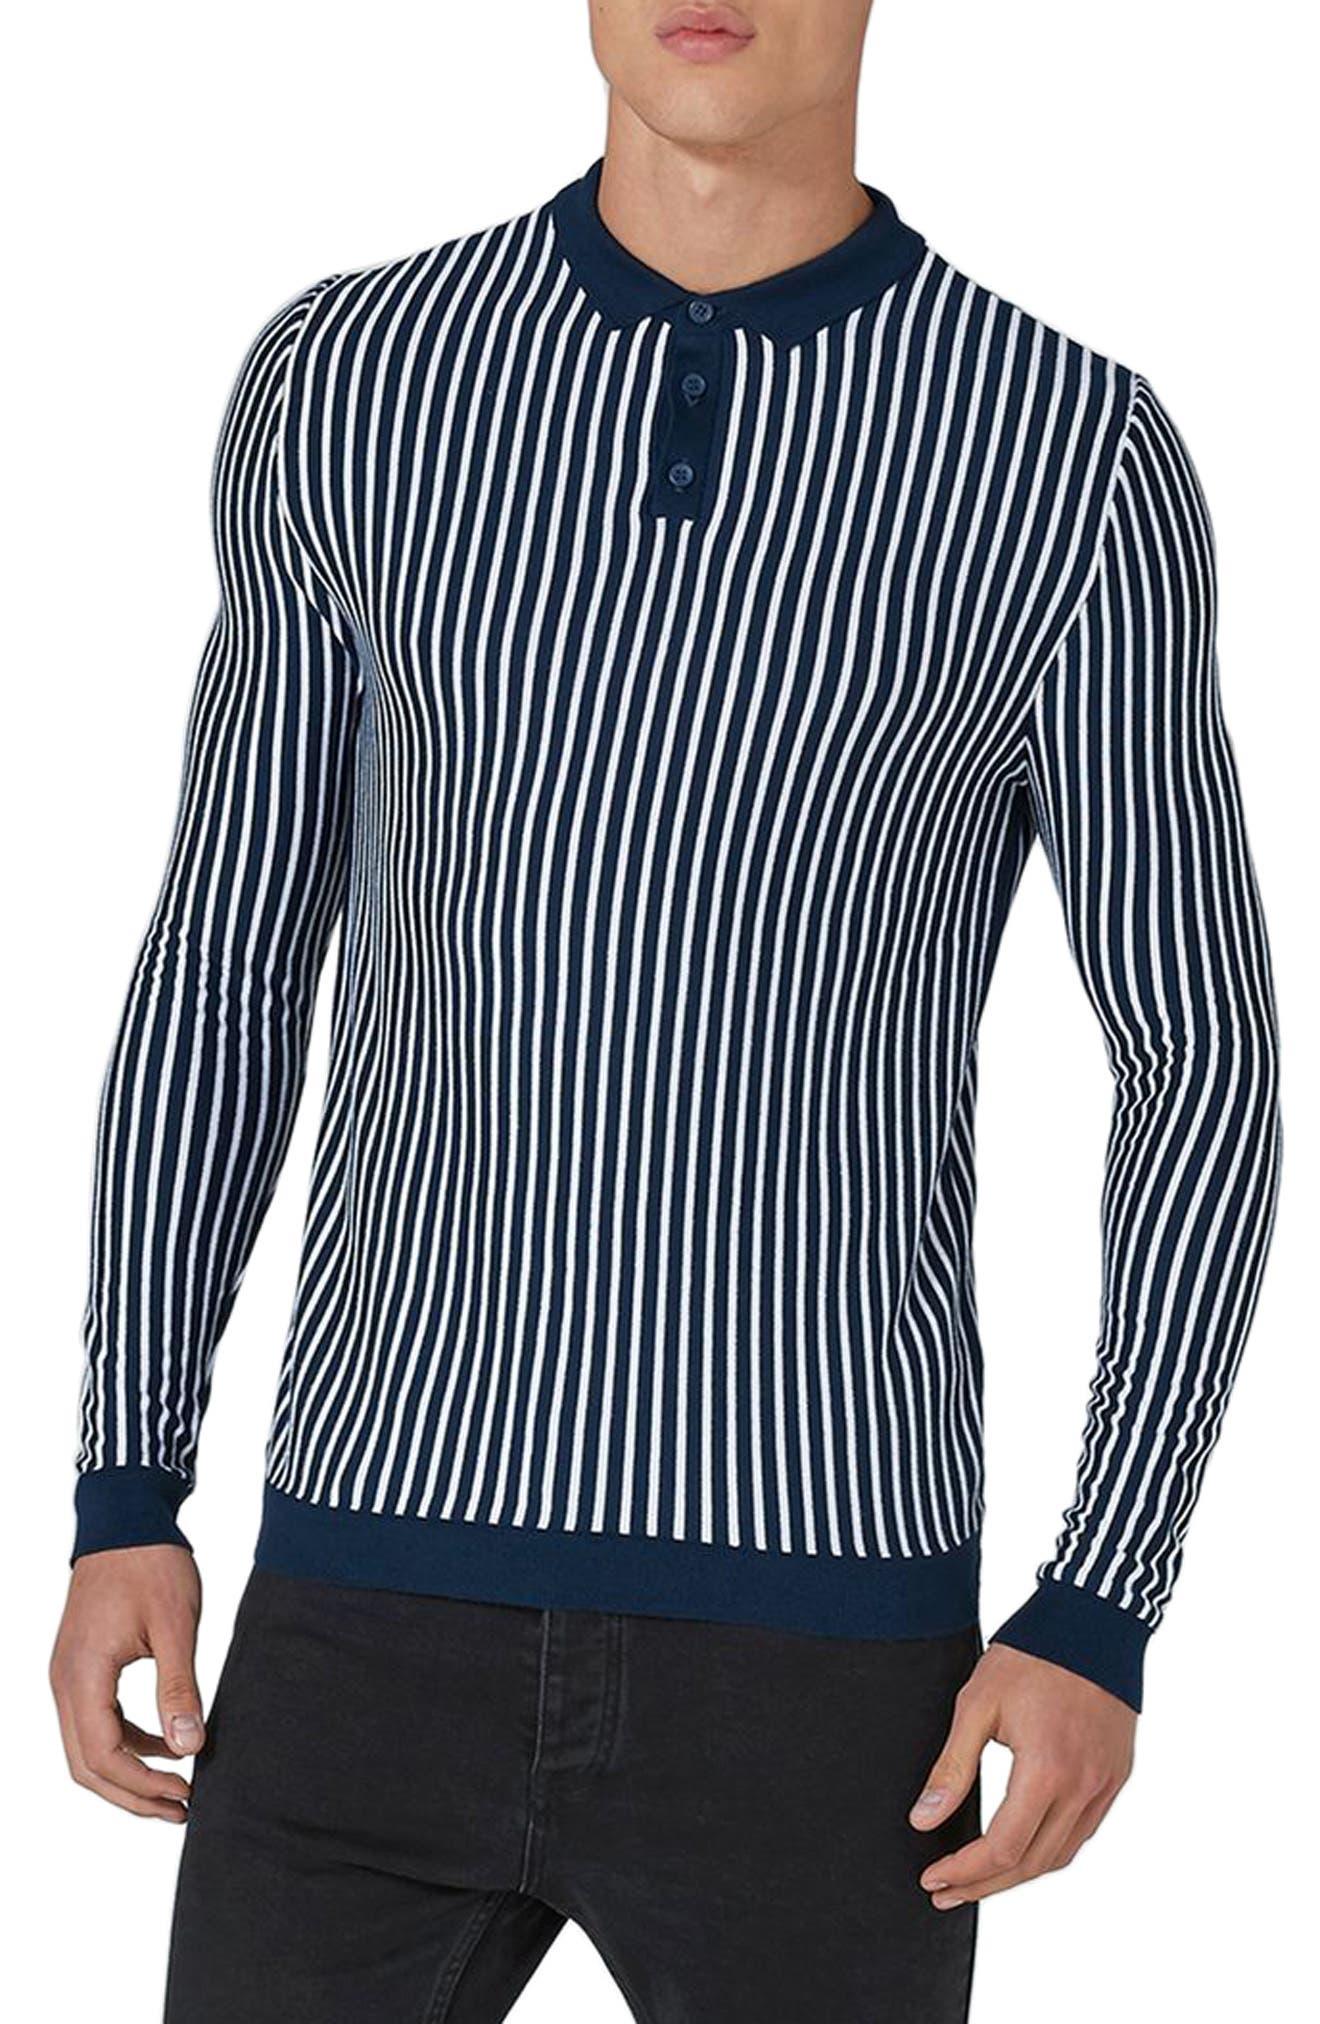 Alternate Image 1 Selected - Topman Stripe Knit Polo Sweater